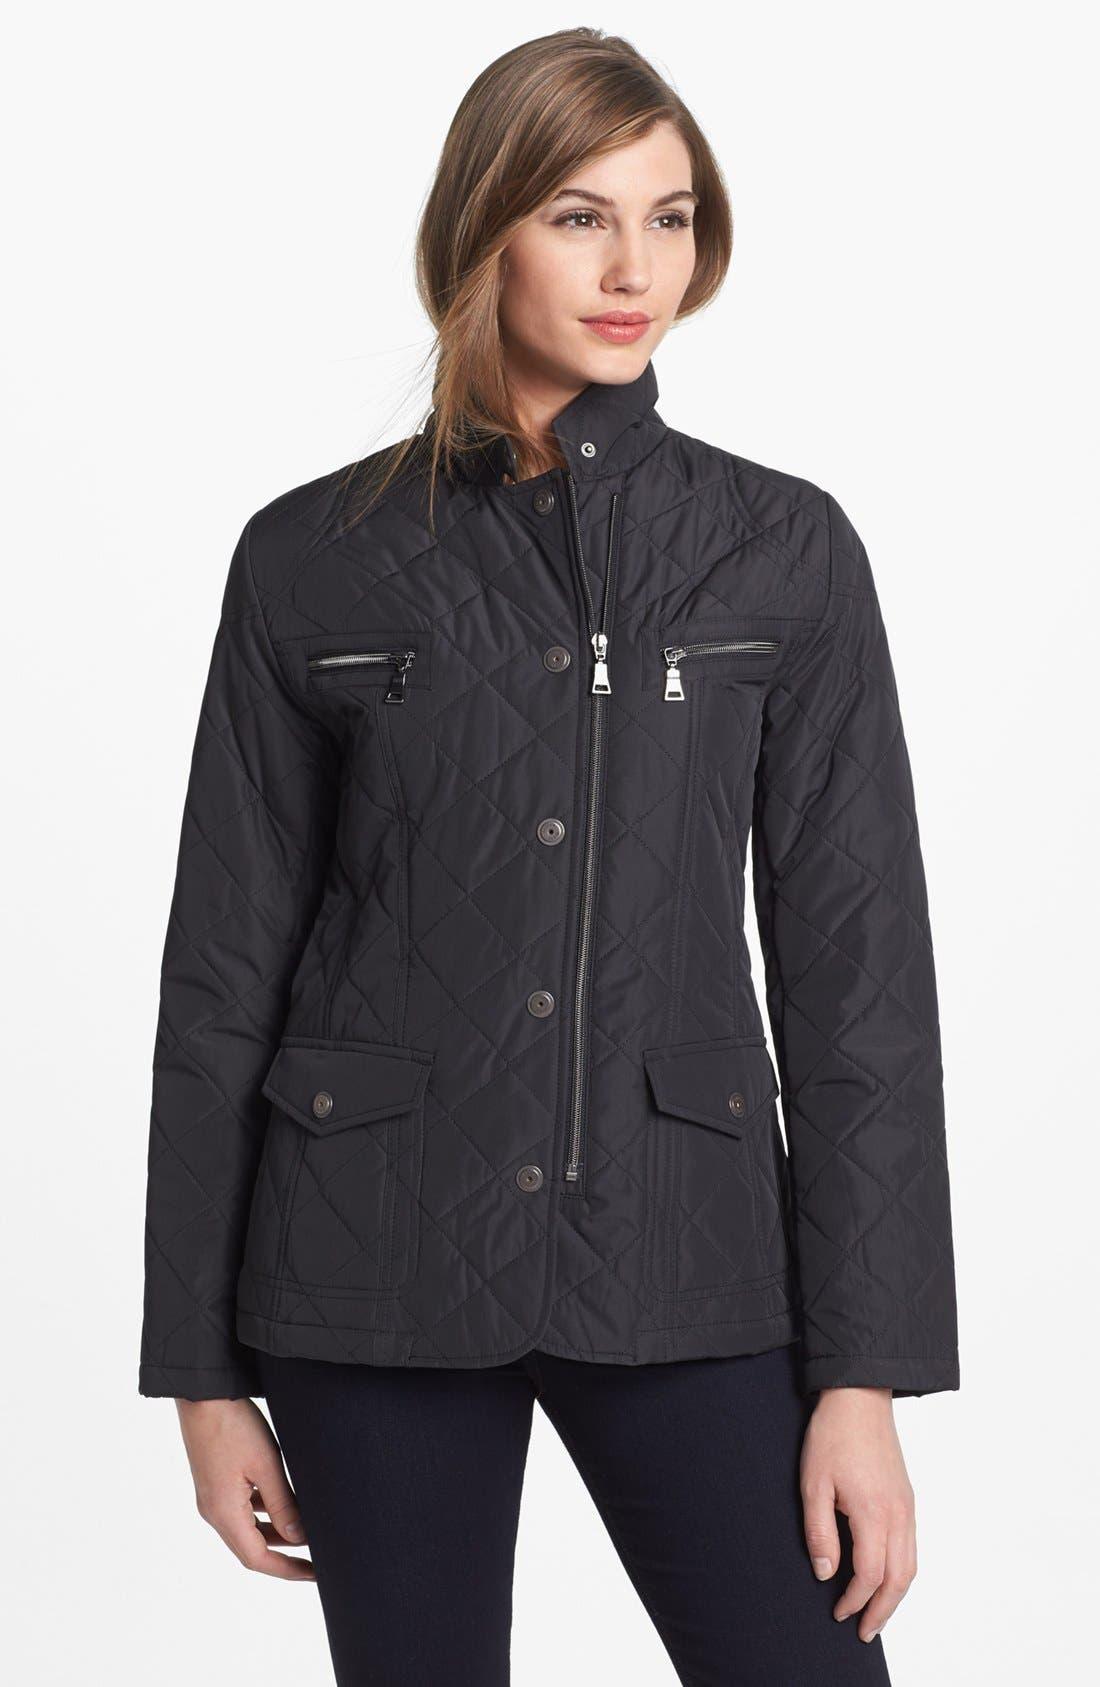 Alternate Image 1 Selected - Kristen Blake Zip & Snap Front Quilted Jacket (Regular & Petite)